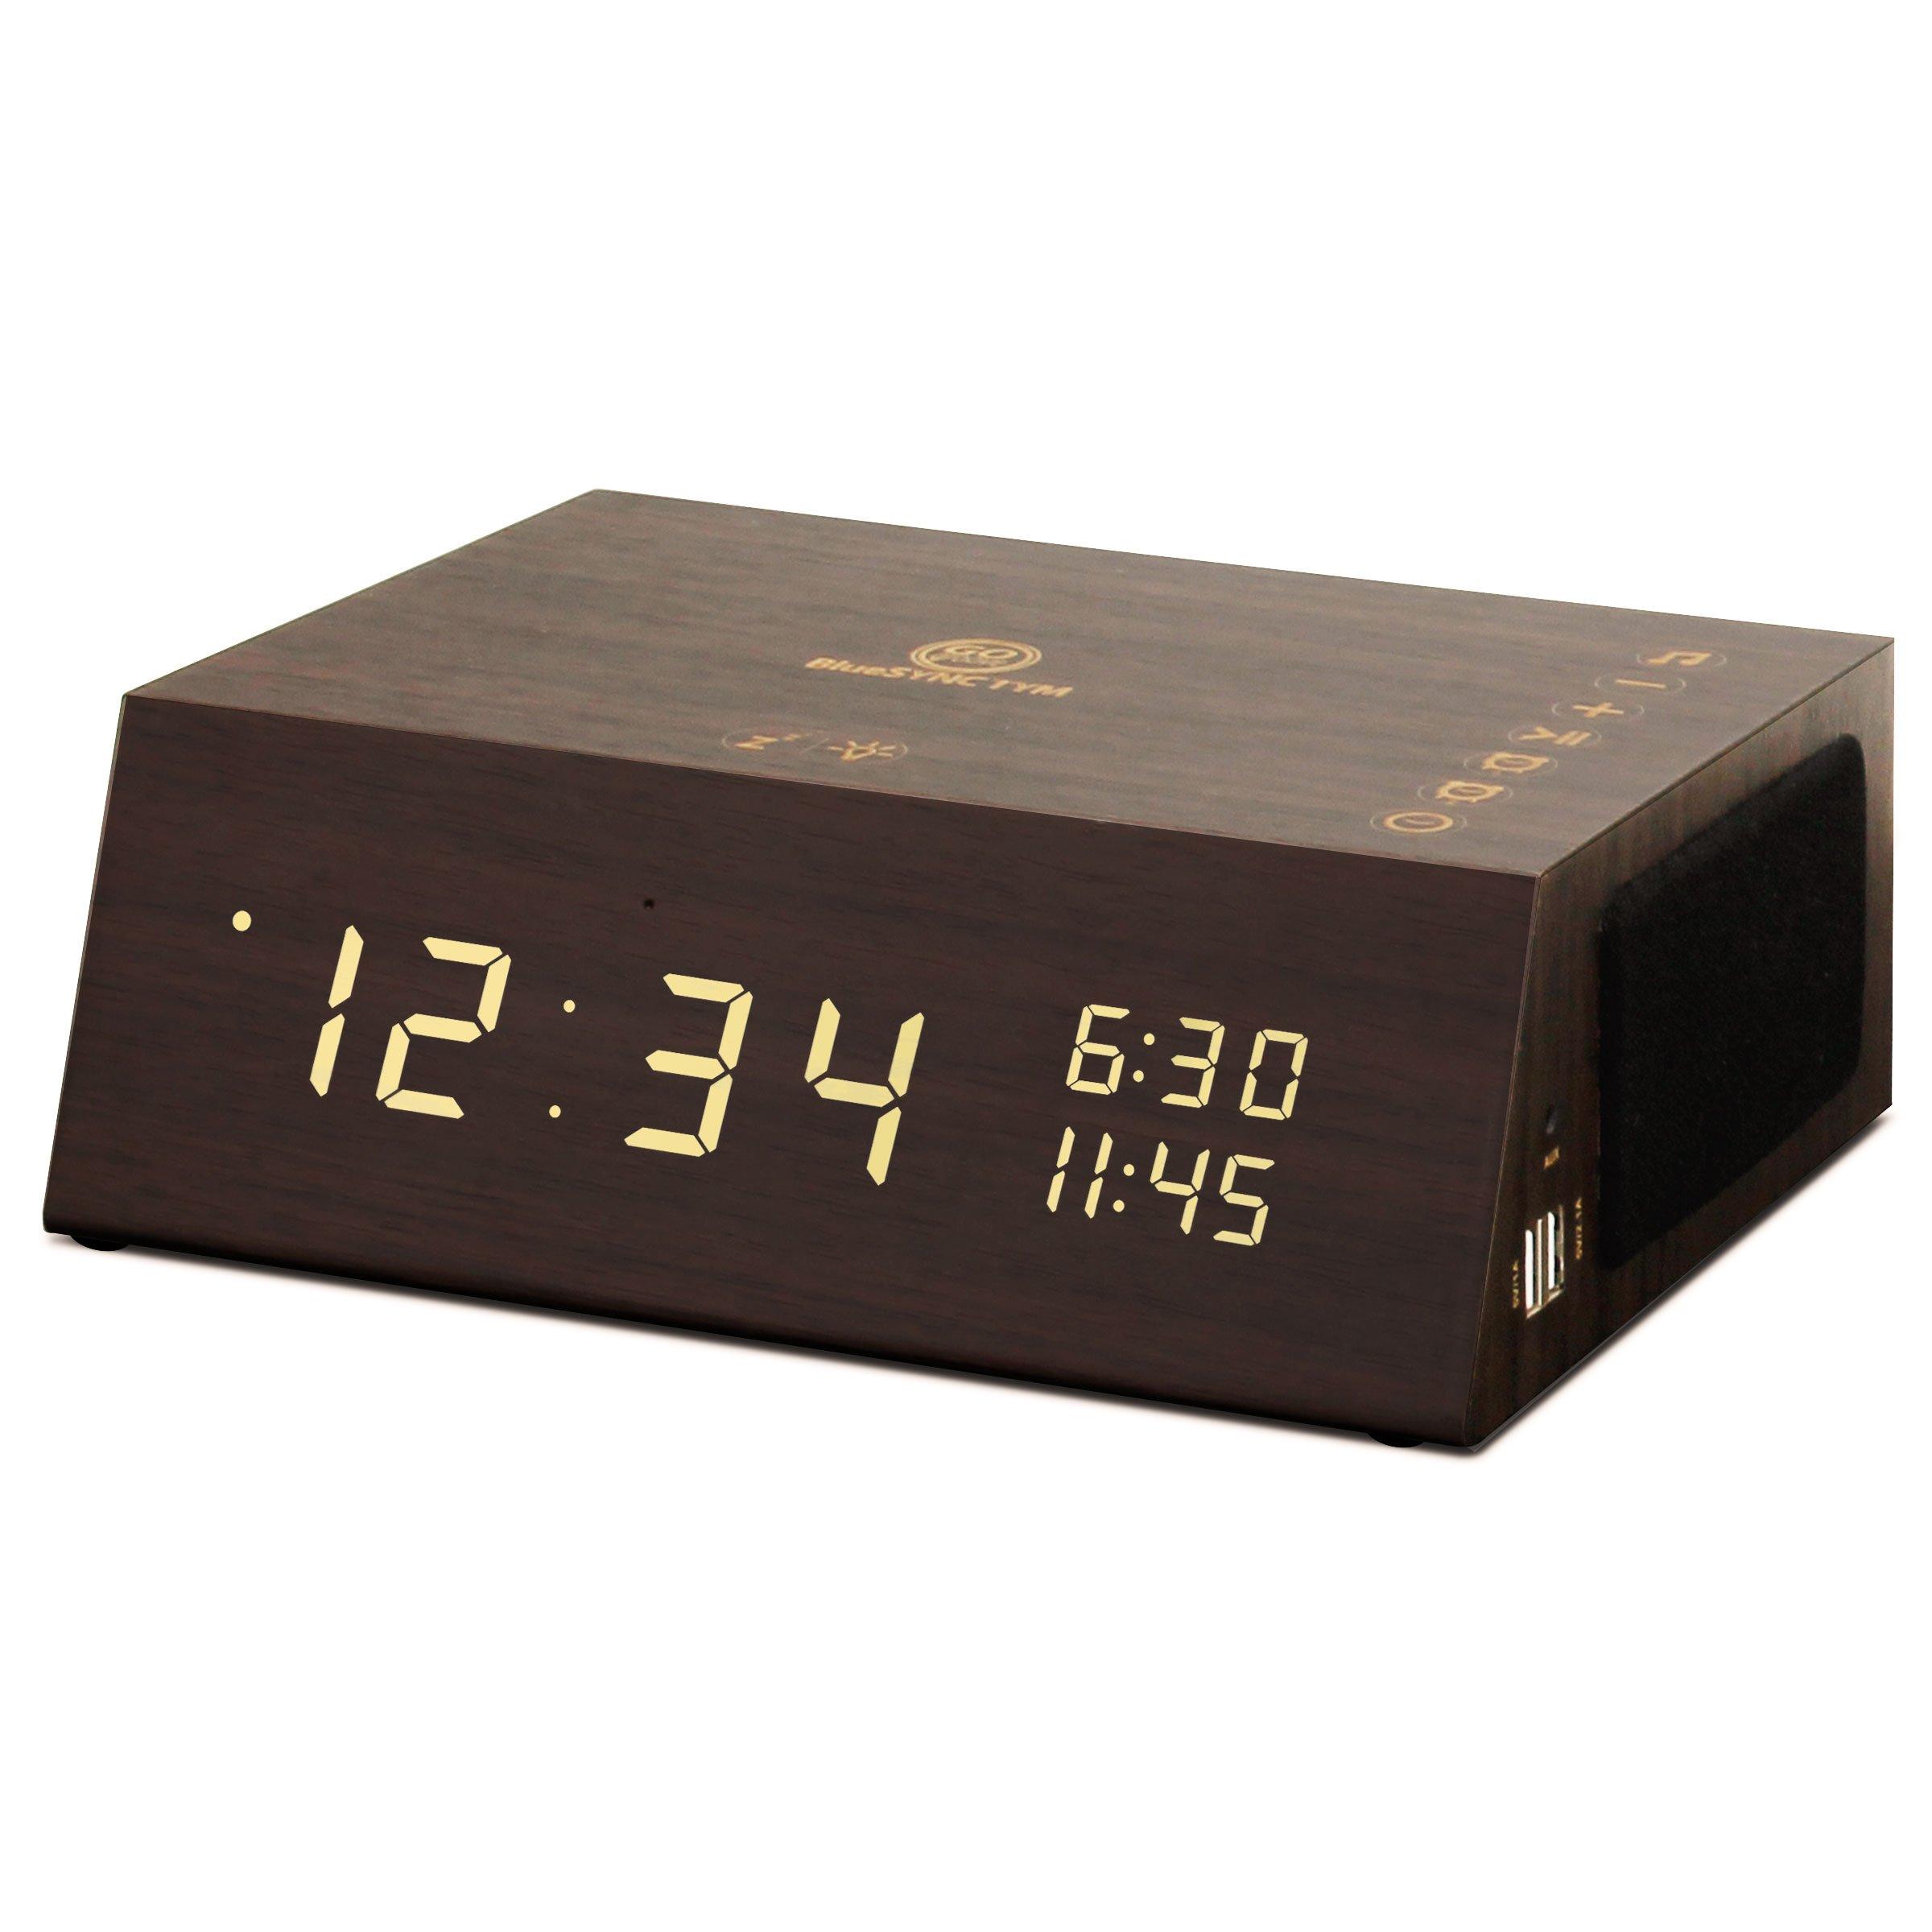 GOgroove Alarm Clock Radio Bluetooth Speaker TYM+ [2018 Edition] Wood Digital Alarm Clock LED with FM Radio, Battery Backup, USB Phone Charging Ports, 3.5mm AUX, Built-in Mic (Dark Finish)